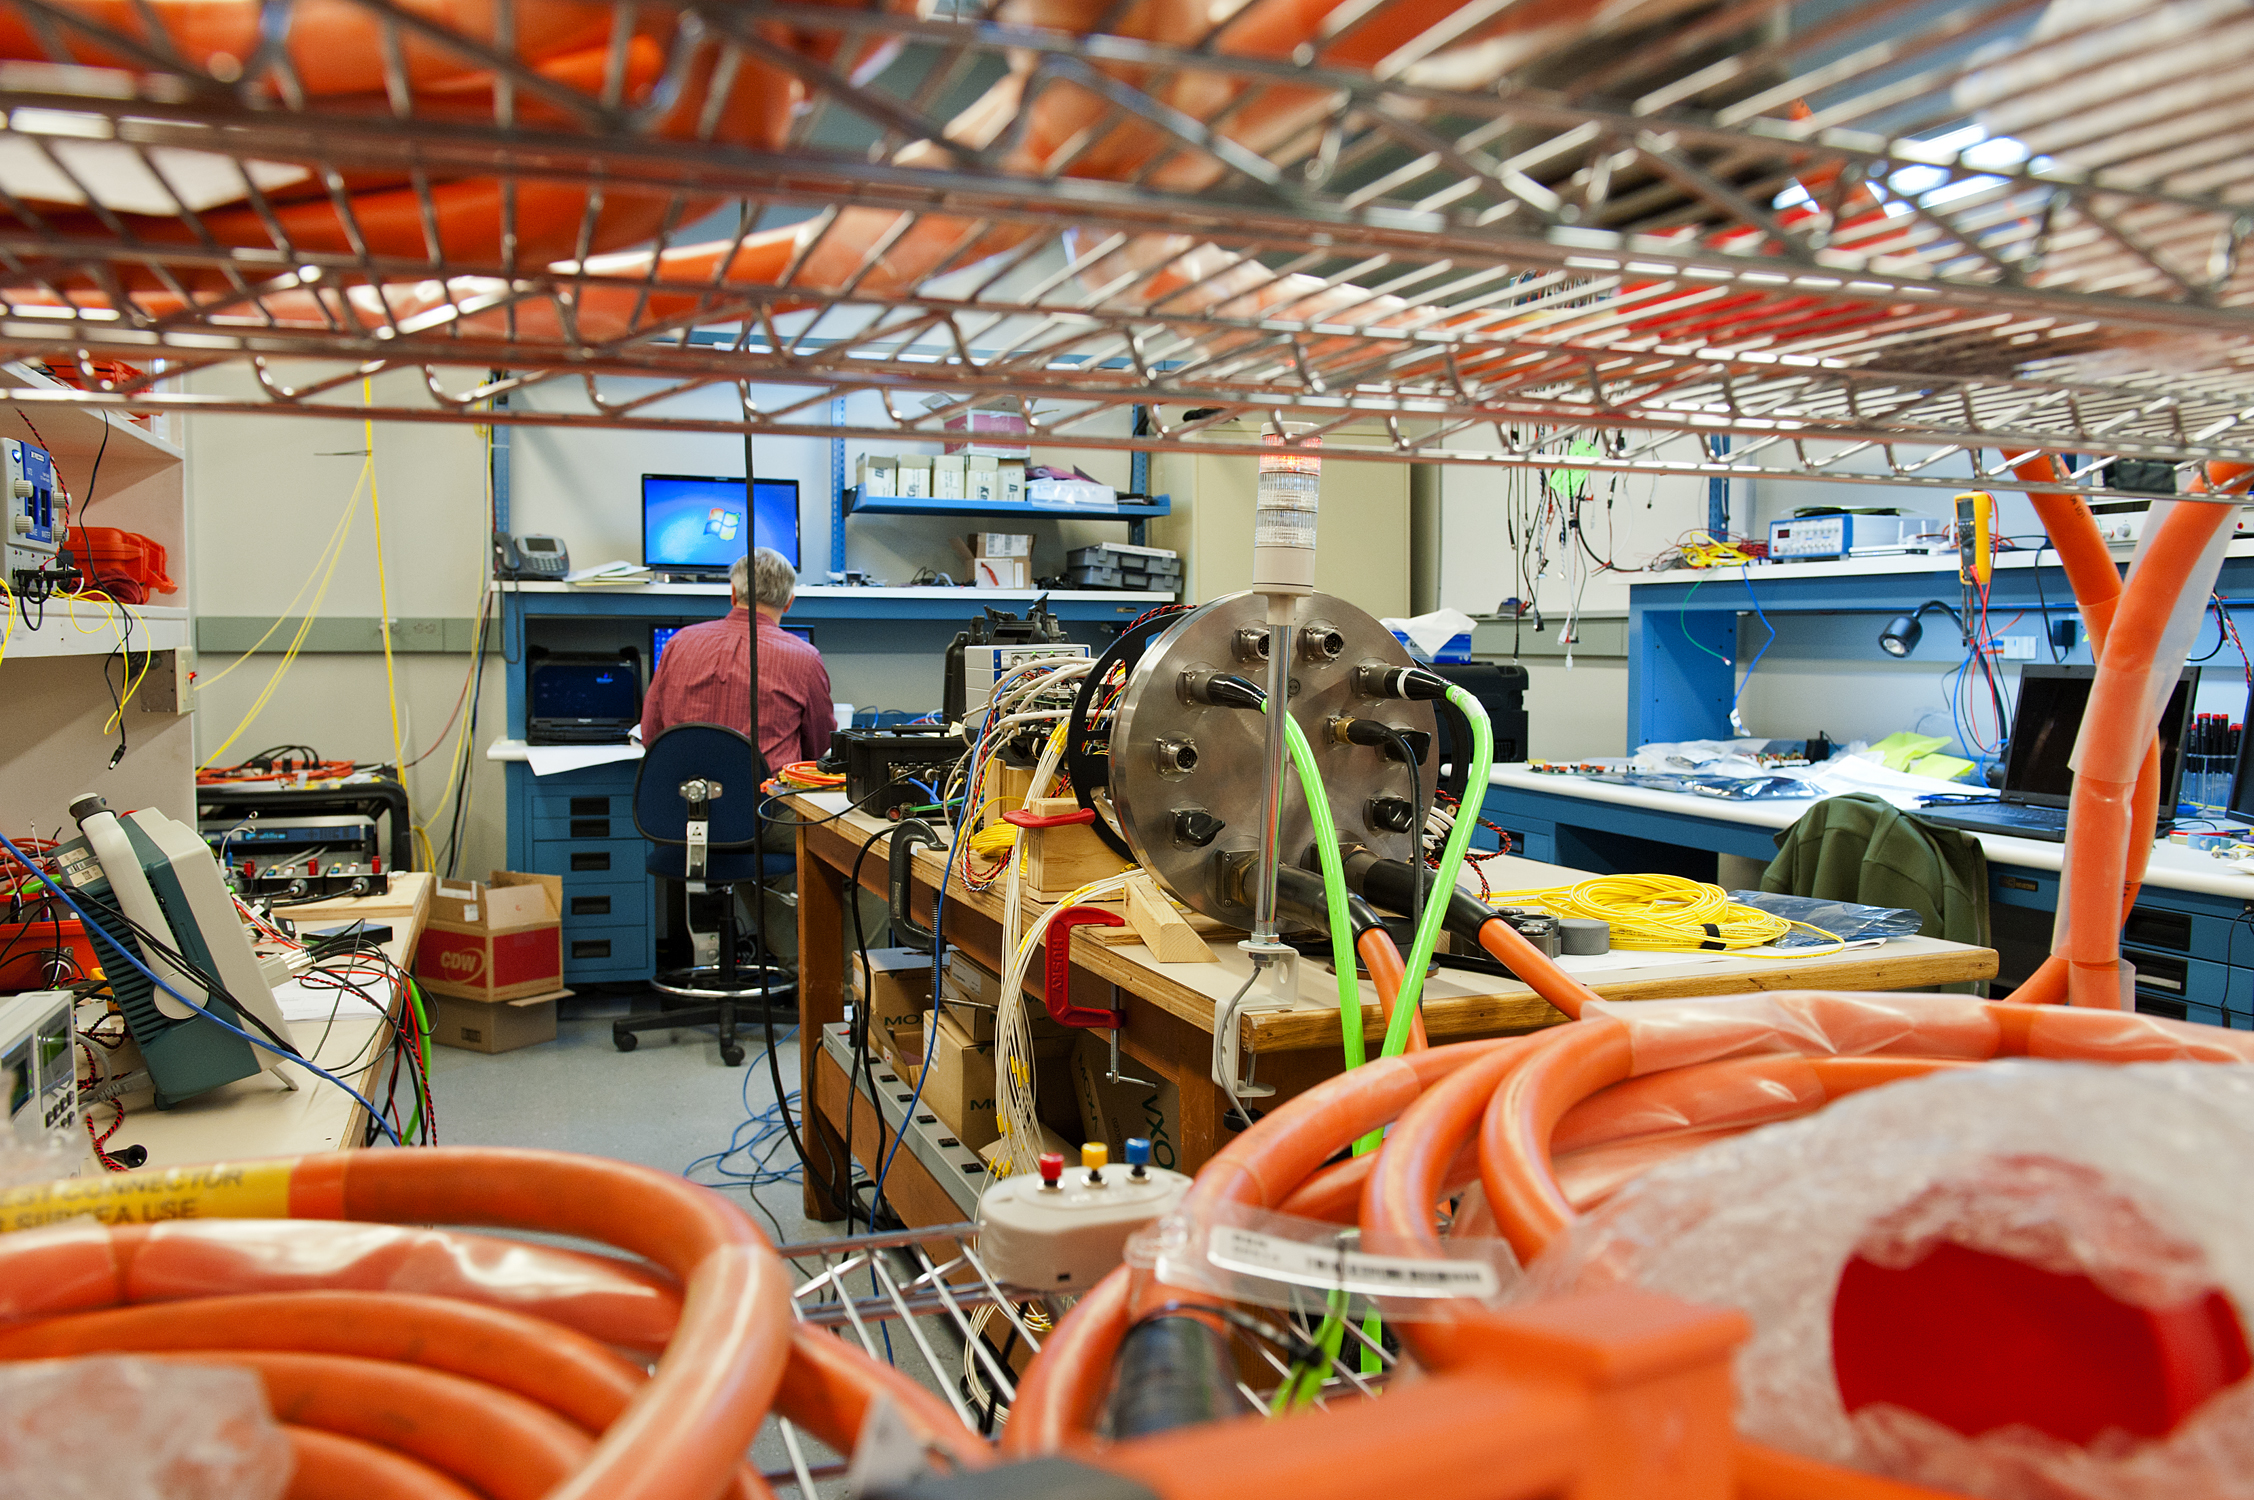 UW lab for OOI engineering work